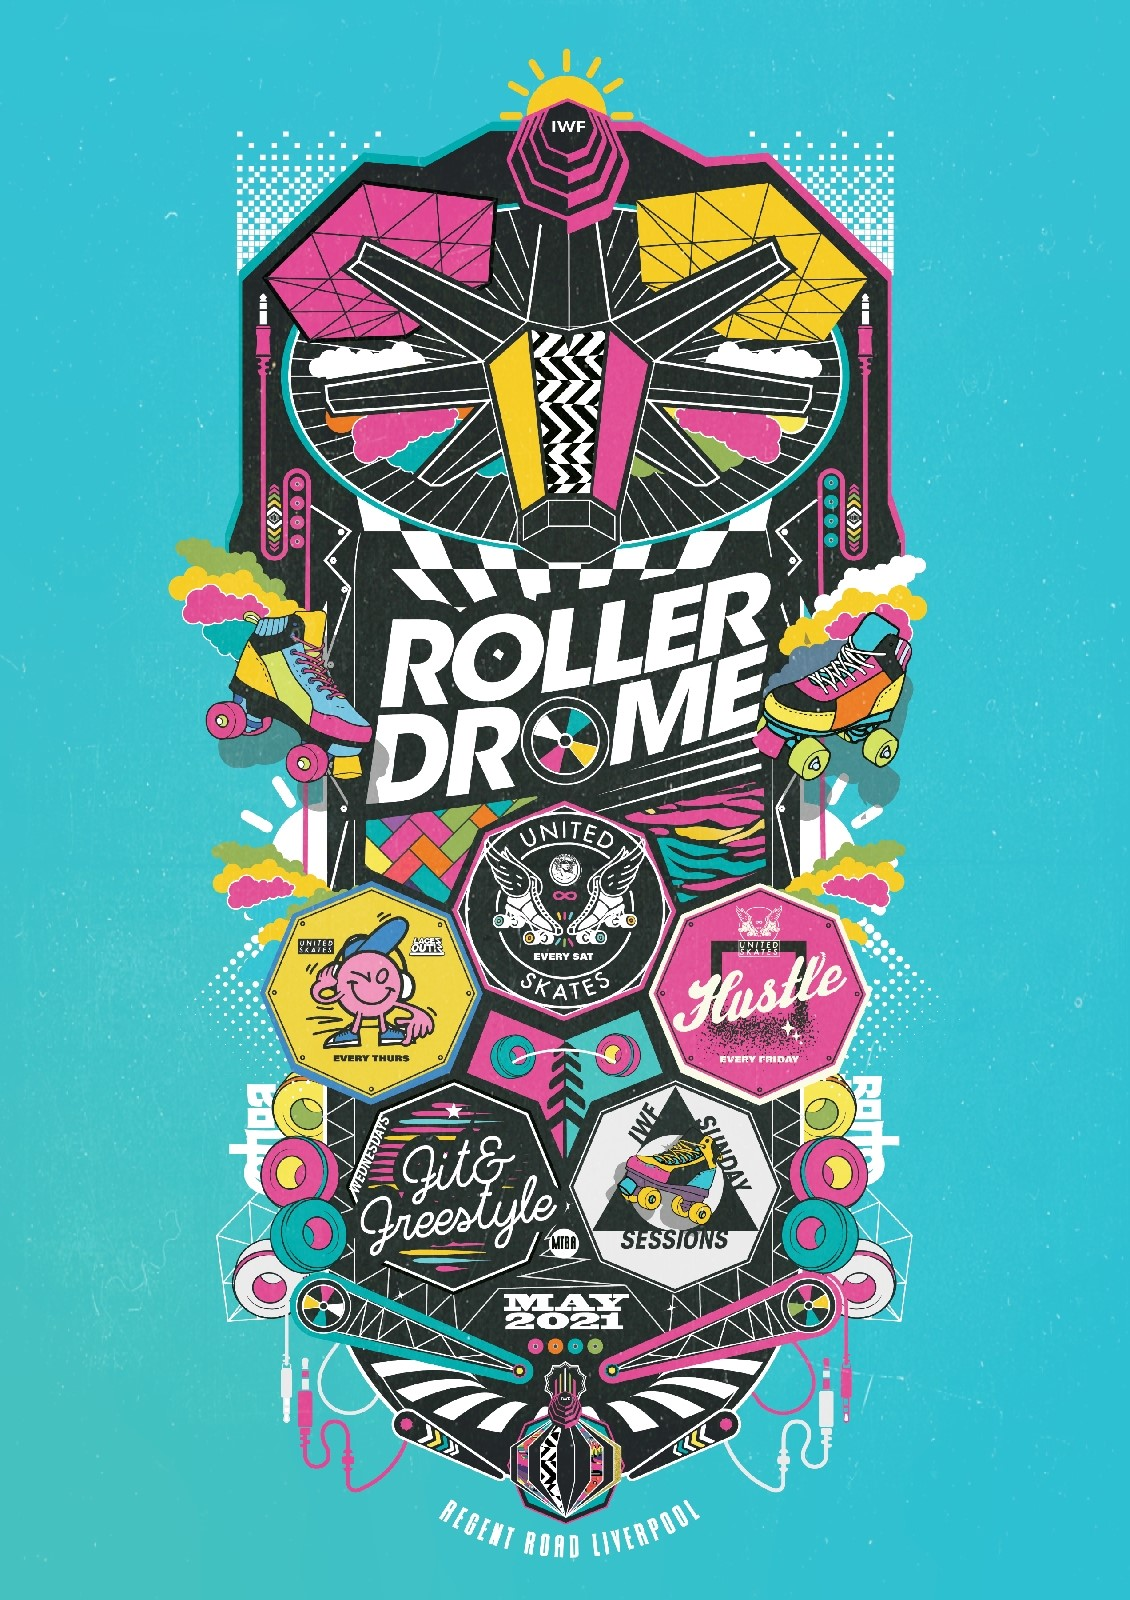 IWF - Rollerdrome